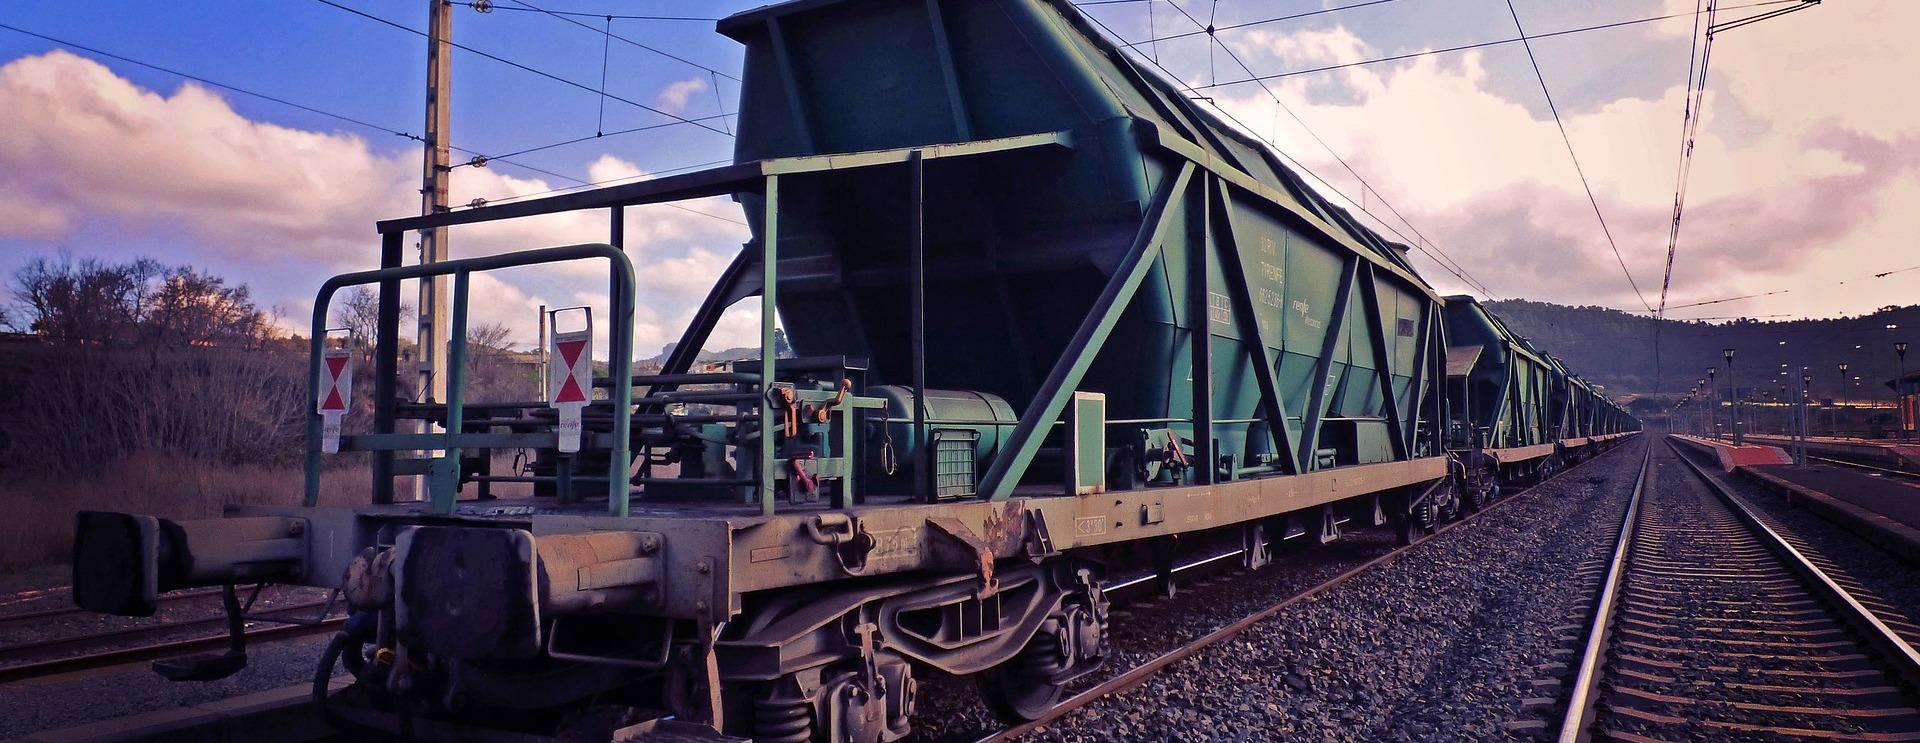 EAEU諸国への輸出を目的とした新しい鉄道特急列車が登場します。